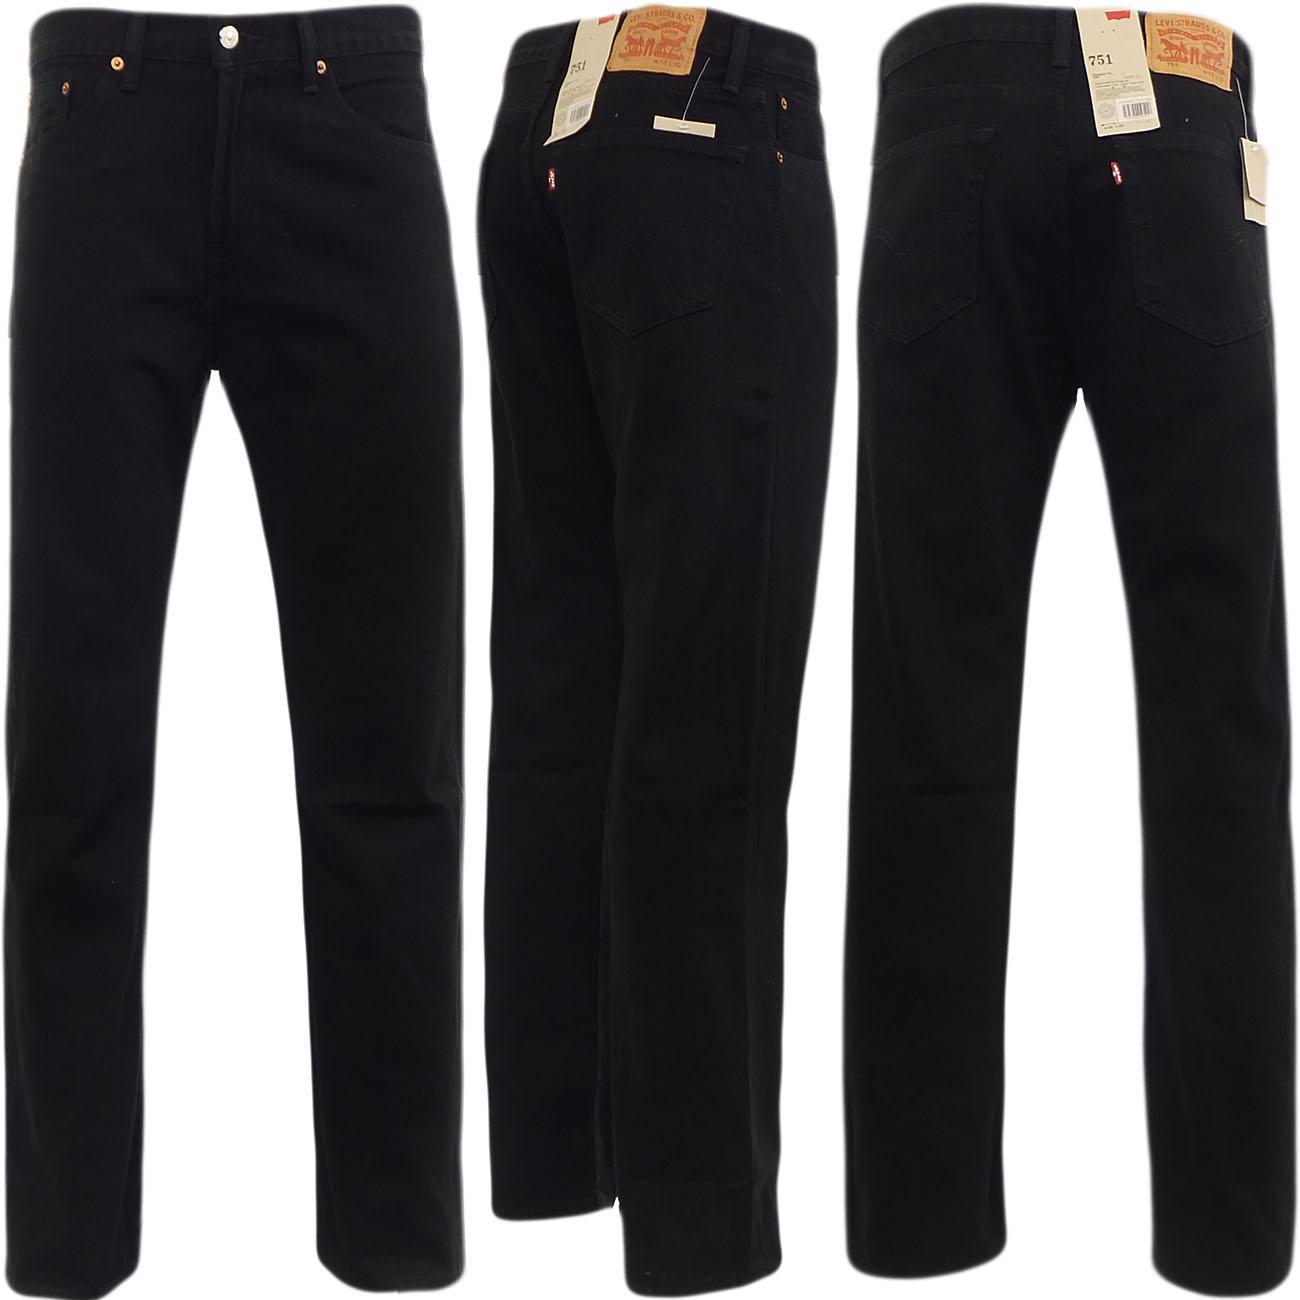 ef7cda31 Black Levi Jeans For Men , www.imgkid.com - The Image Kid